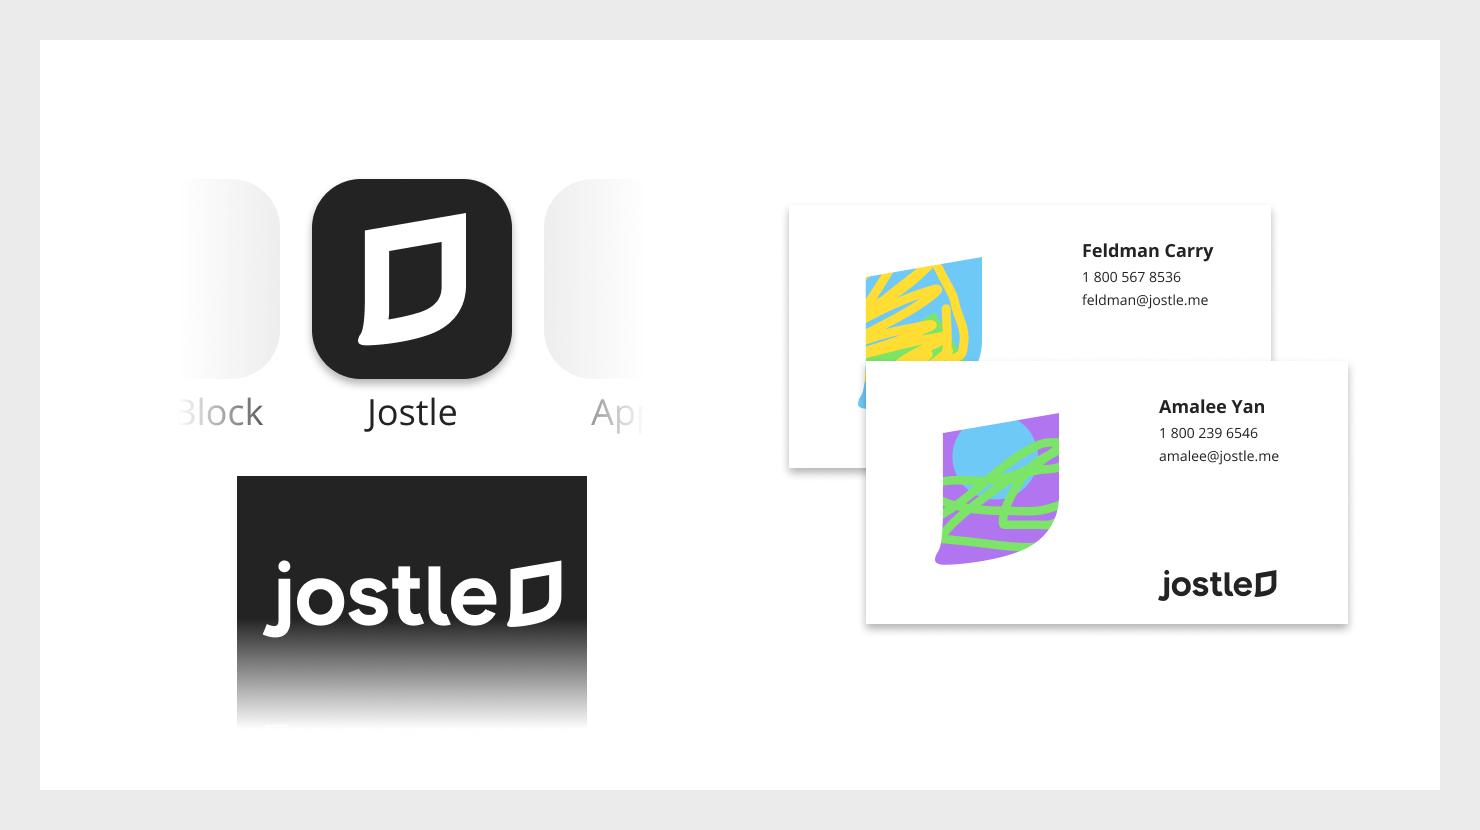 jostle rebrand logo assets